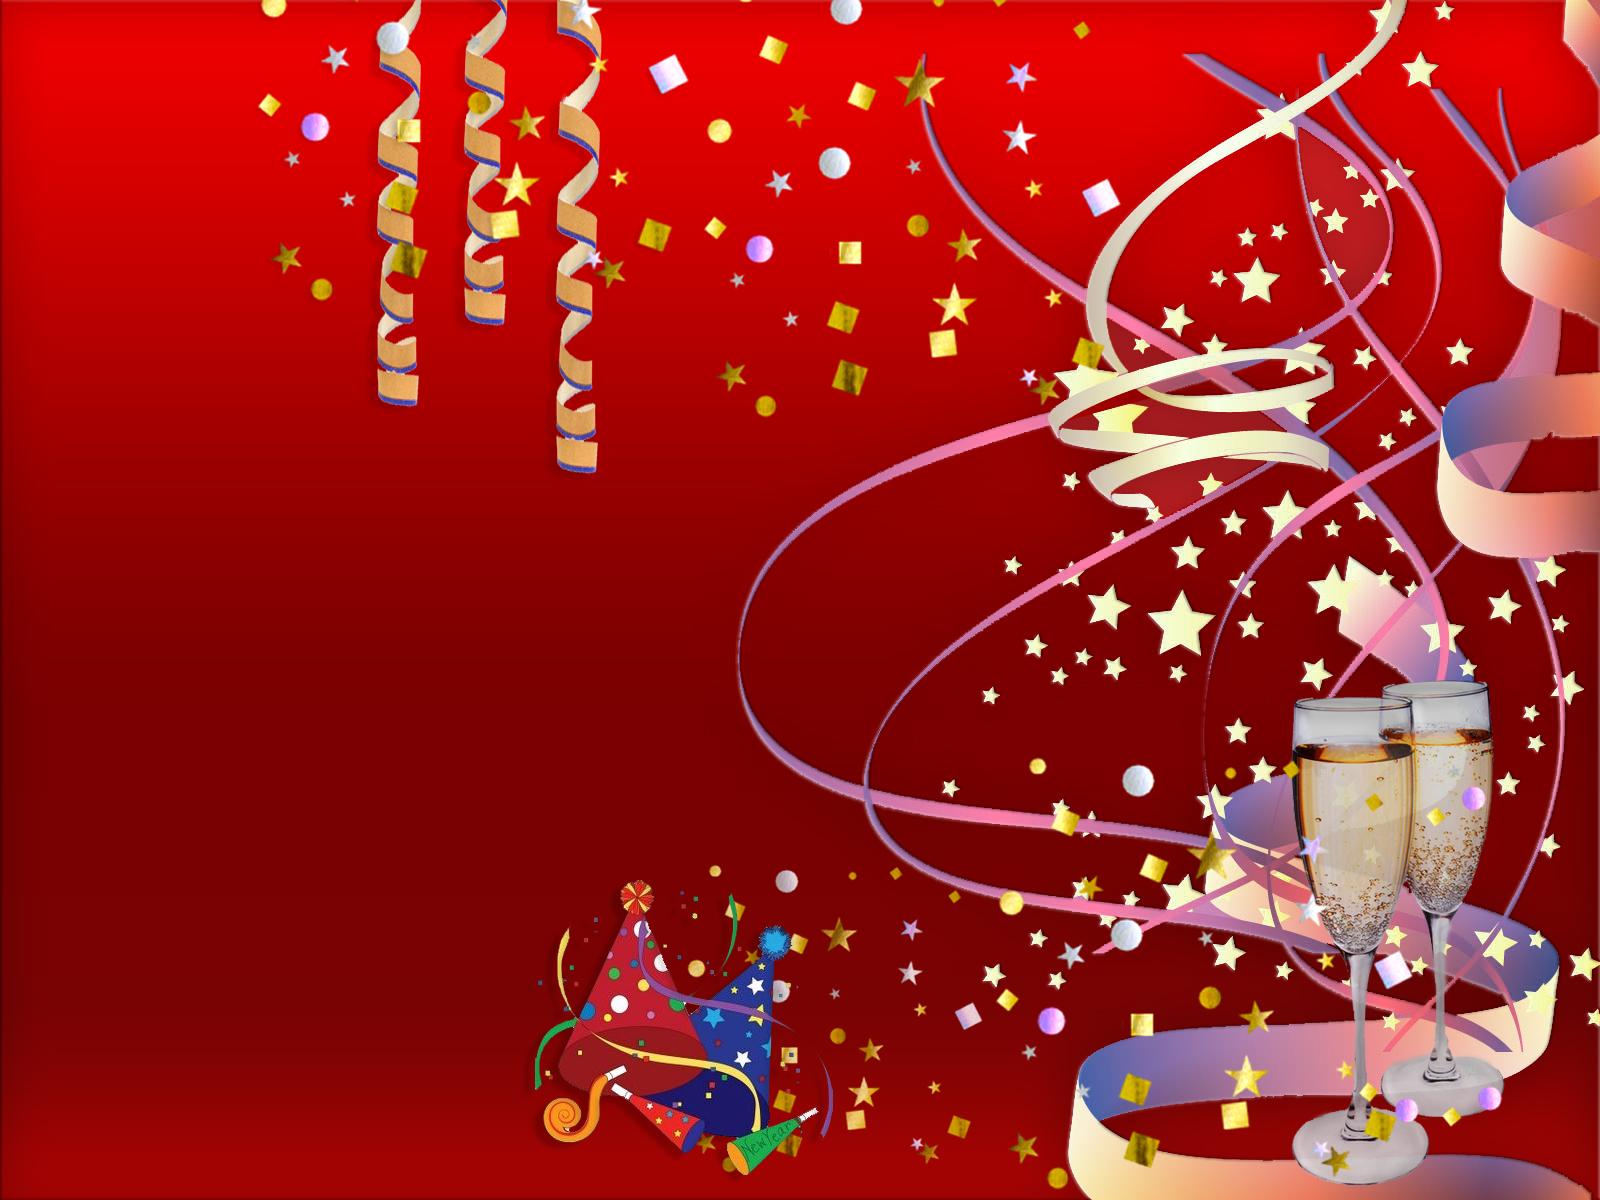 Chinese New Year Wallpaper HD WallpaperSafari